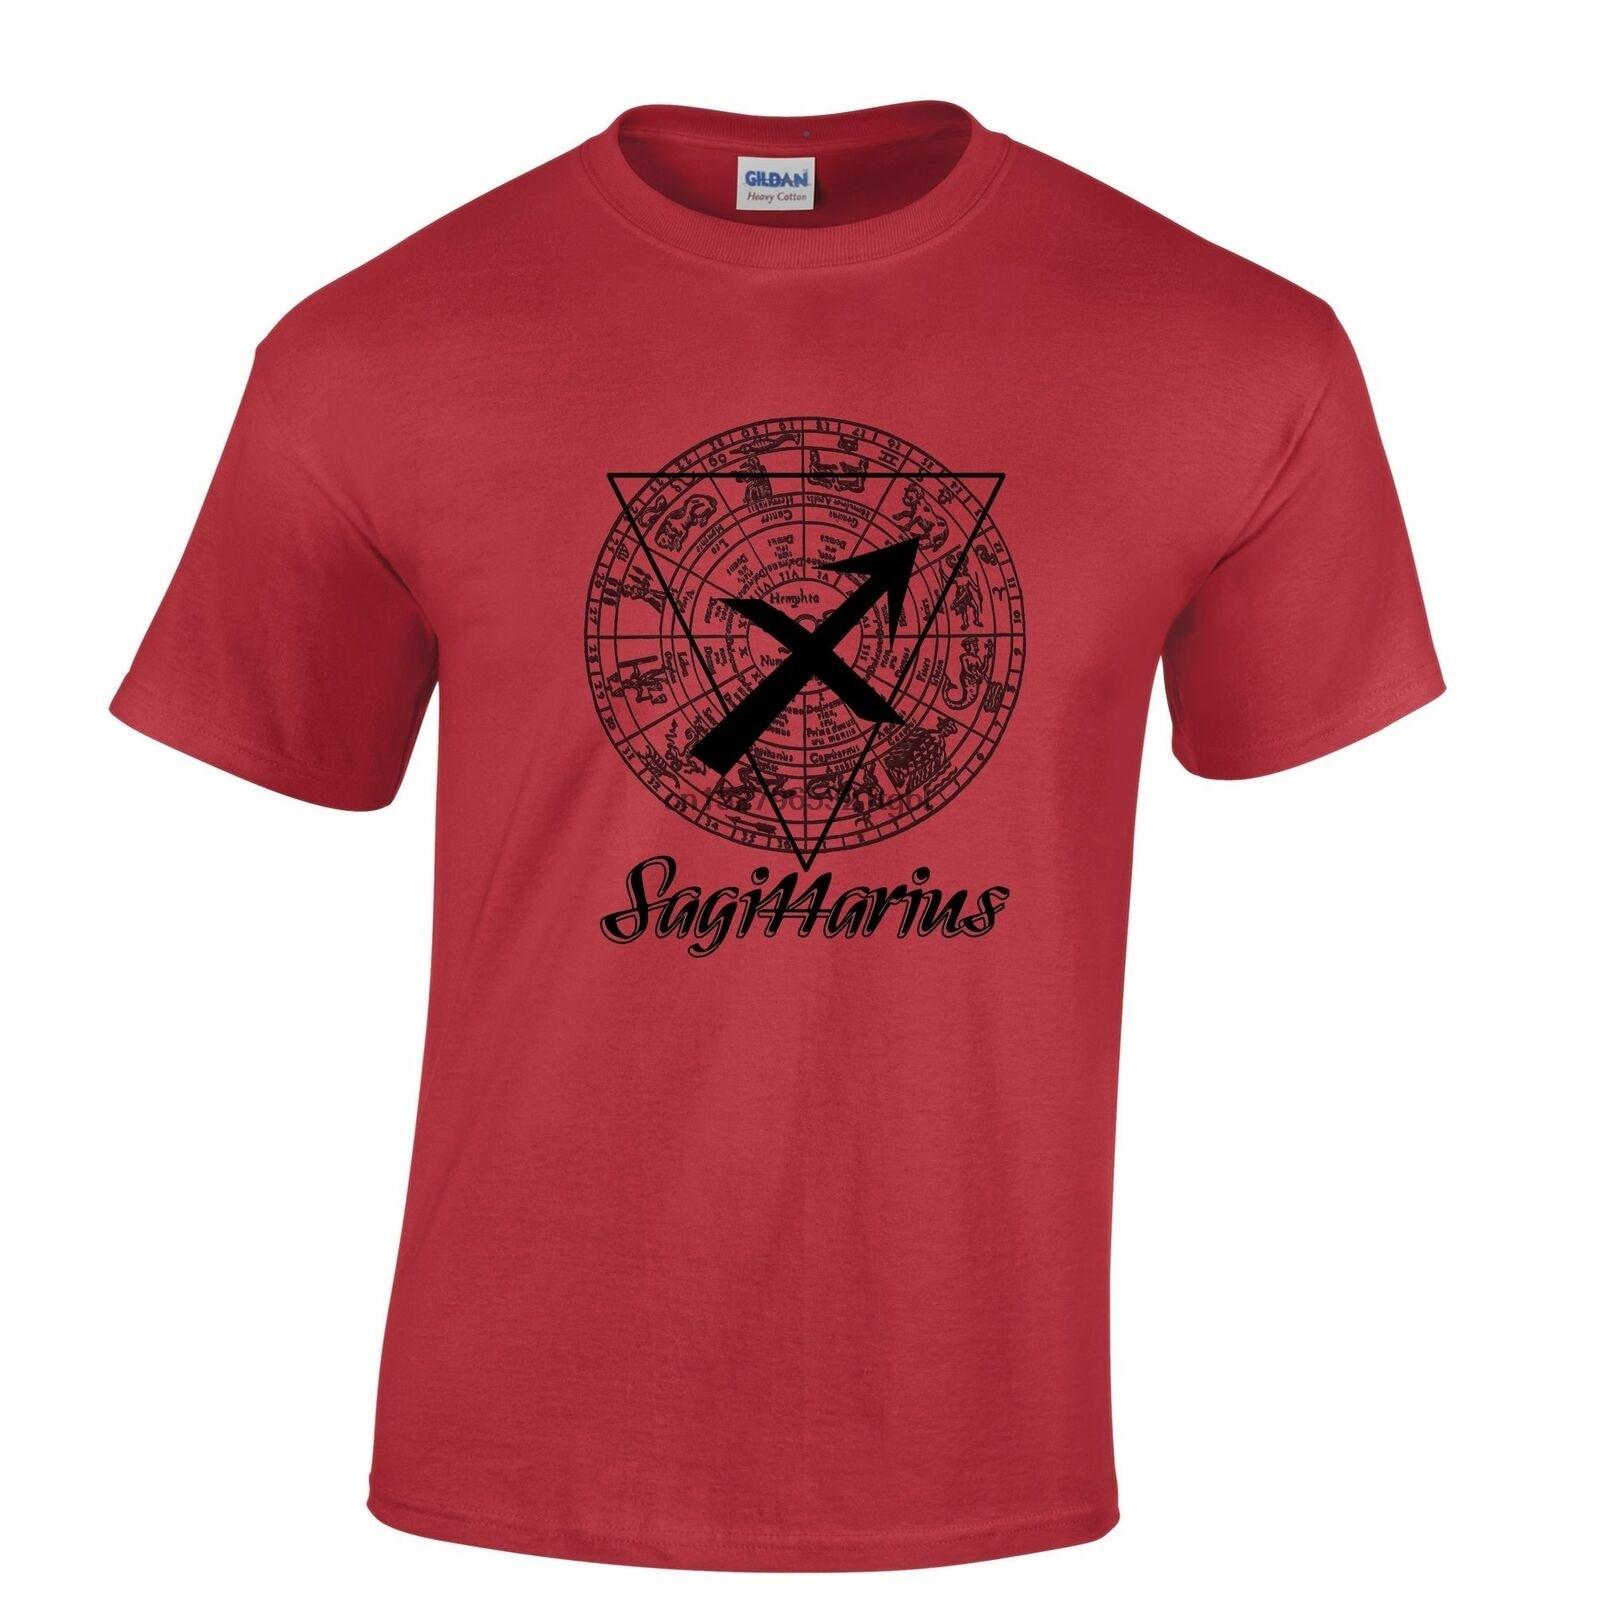 Horoscope T Shirt Sagittarius Zodiac Sign Birthday Fortune Tellin Harajuku streetwear shirt men